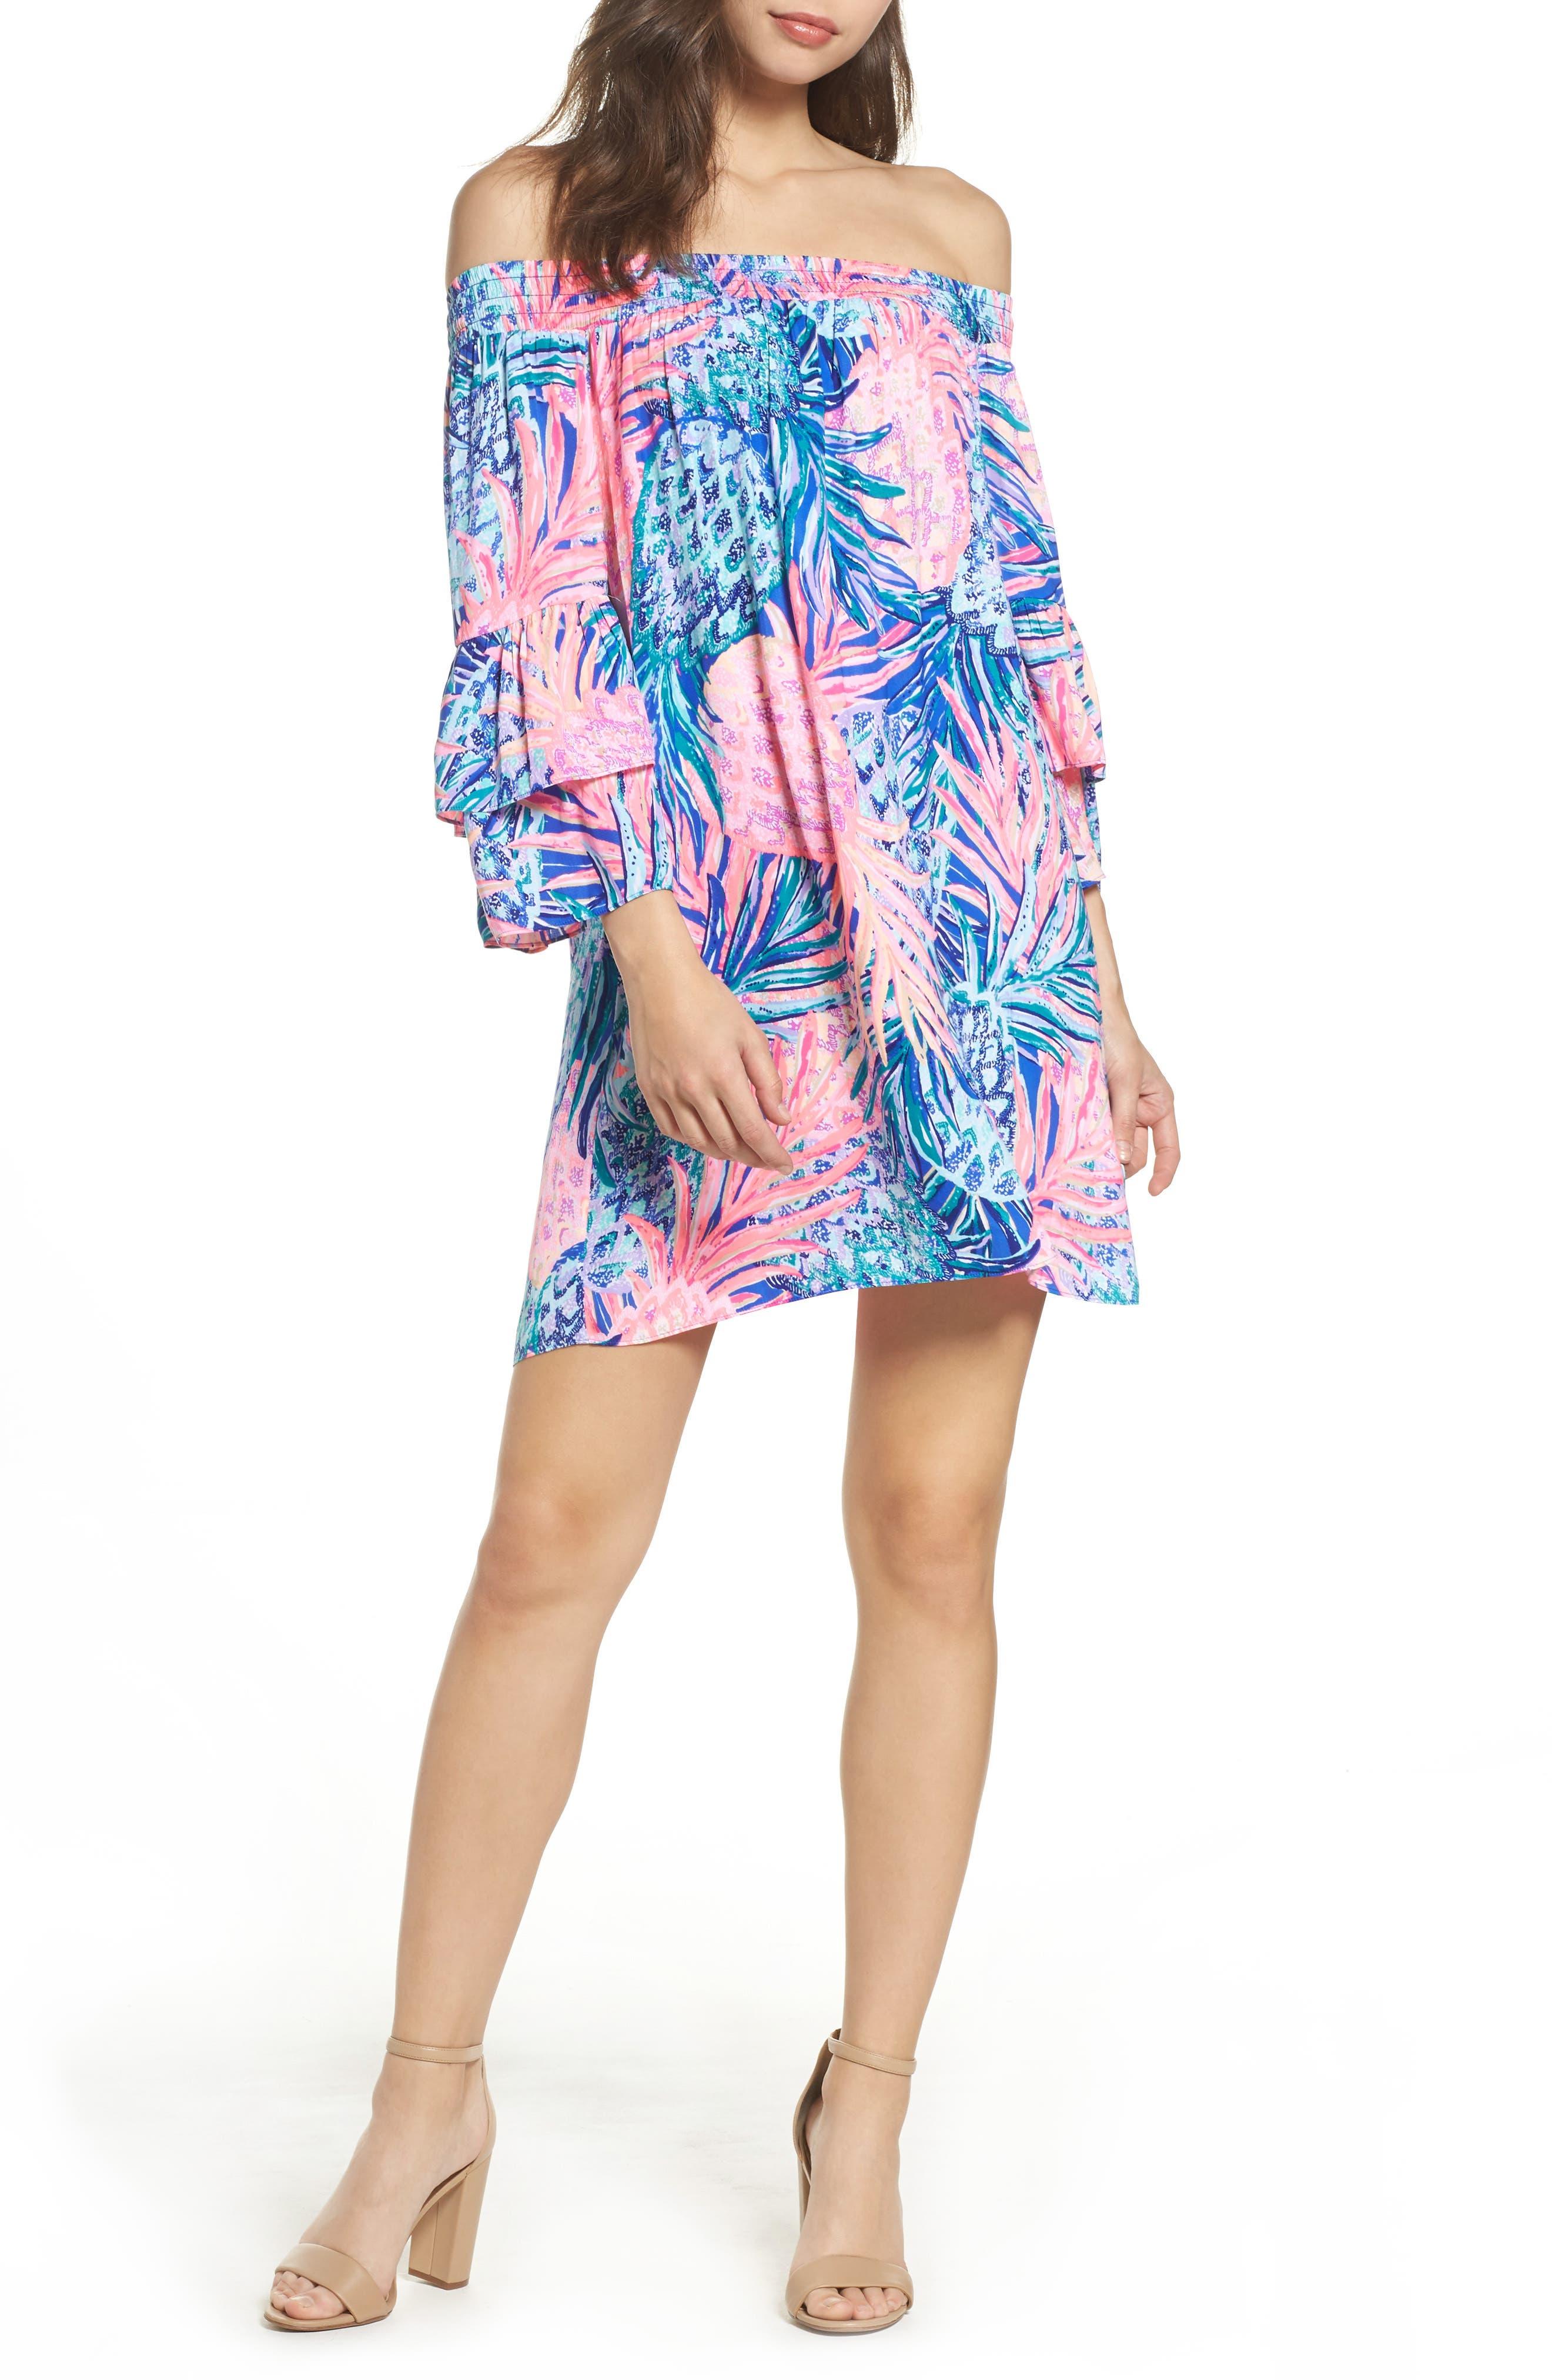 Alternate Image 1 Selected - Lilly Pulitzer® Tobyn Off the Shoulder Dress